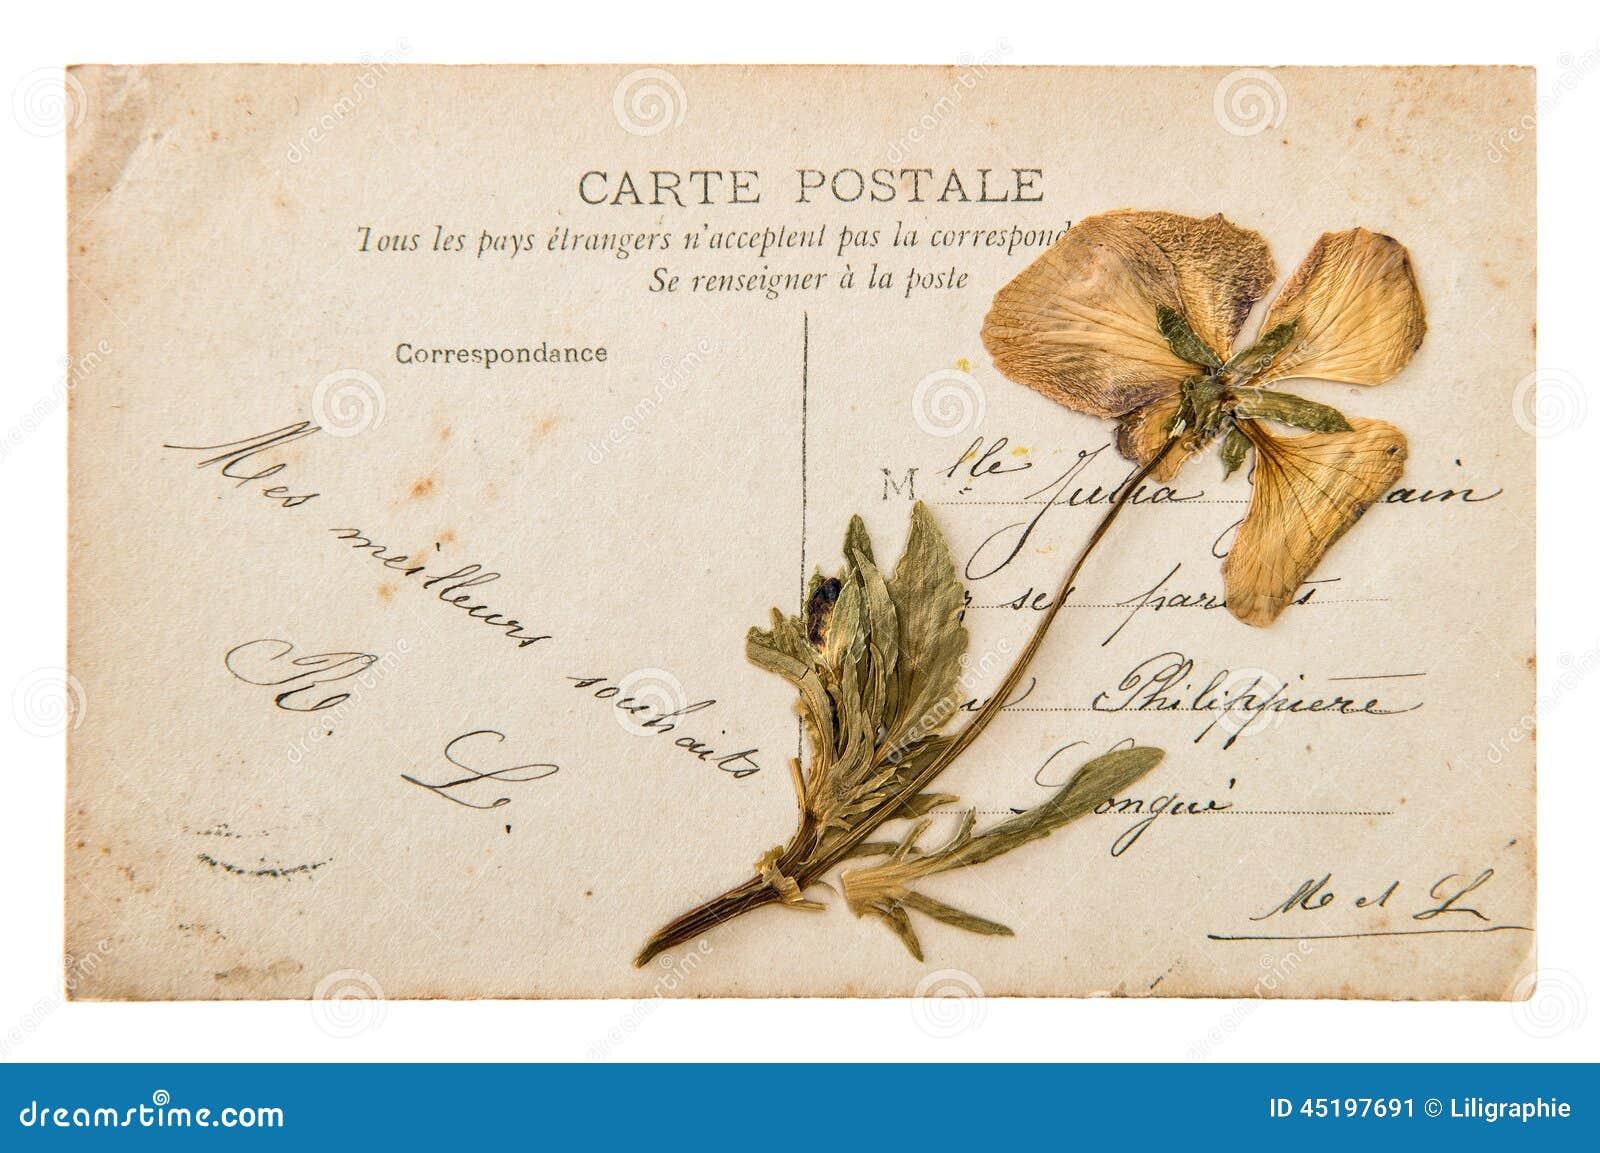 Italian handwritten postcard letter stock photo image 39254147 - Antique French Handwritten Postcard With Dry Pansy Flower 1300x954 Italian Handwritten Postcard Letter Stock